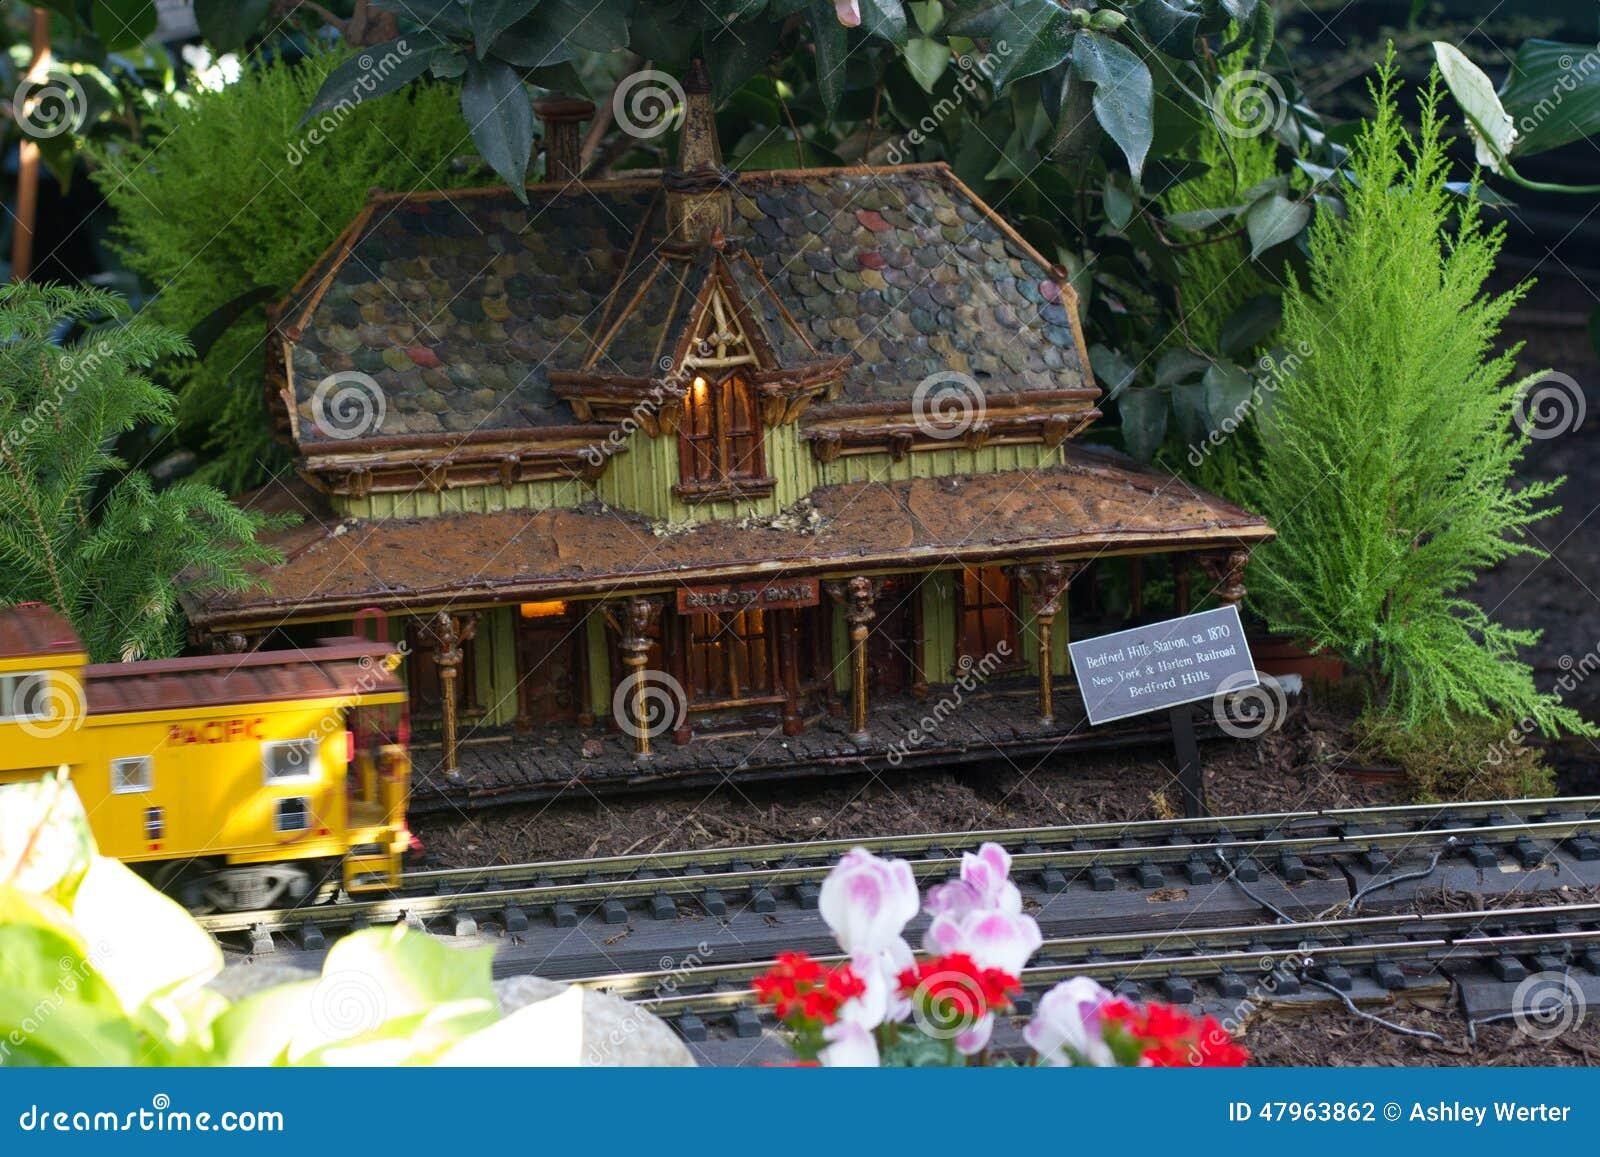 Holiday Train Show Stock Photo Image 47963862